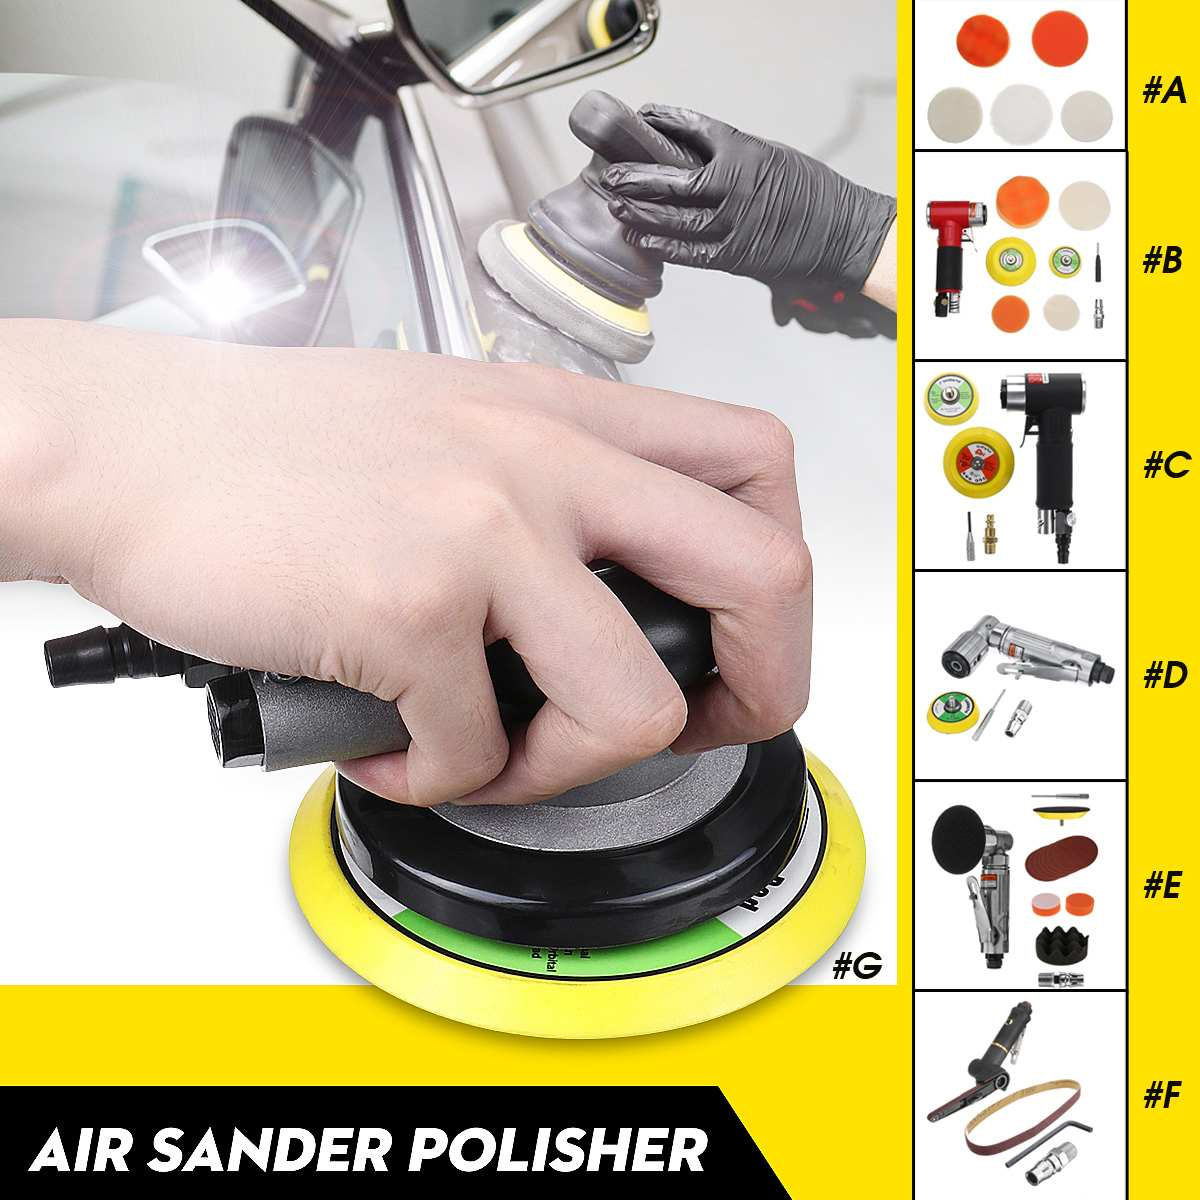 Sander Polisher Dual Action Random Orbital Polishing Pad Car Pneumatic Grinding For Car Paint Care Tool